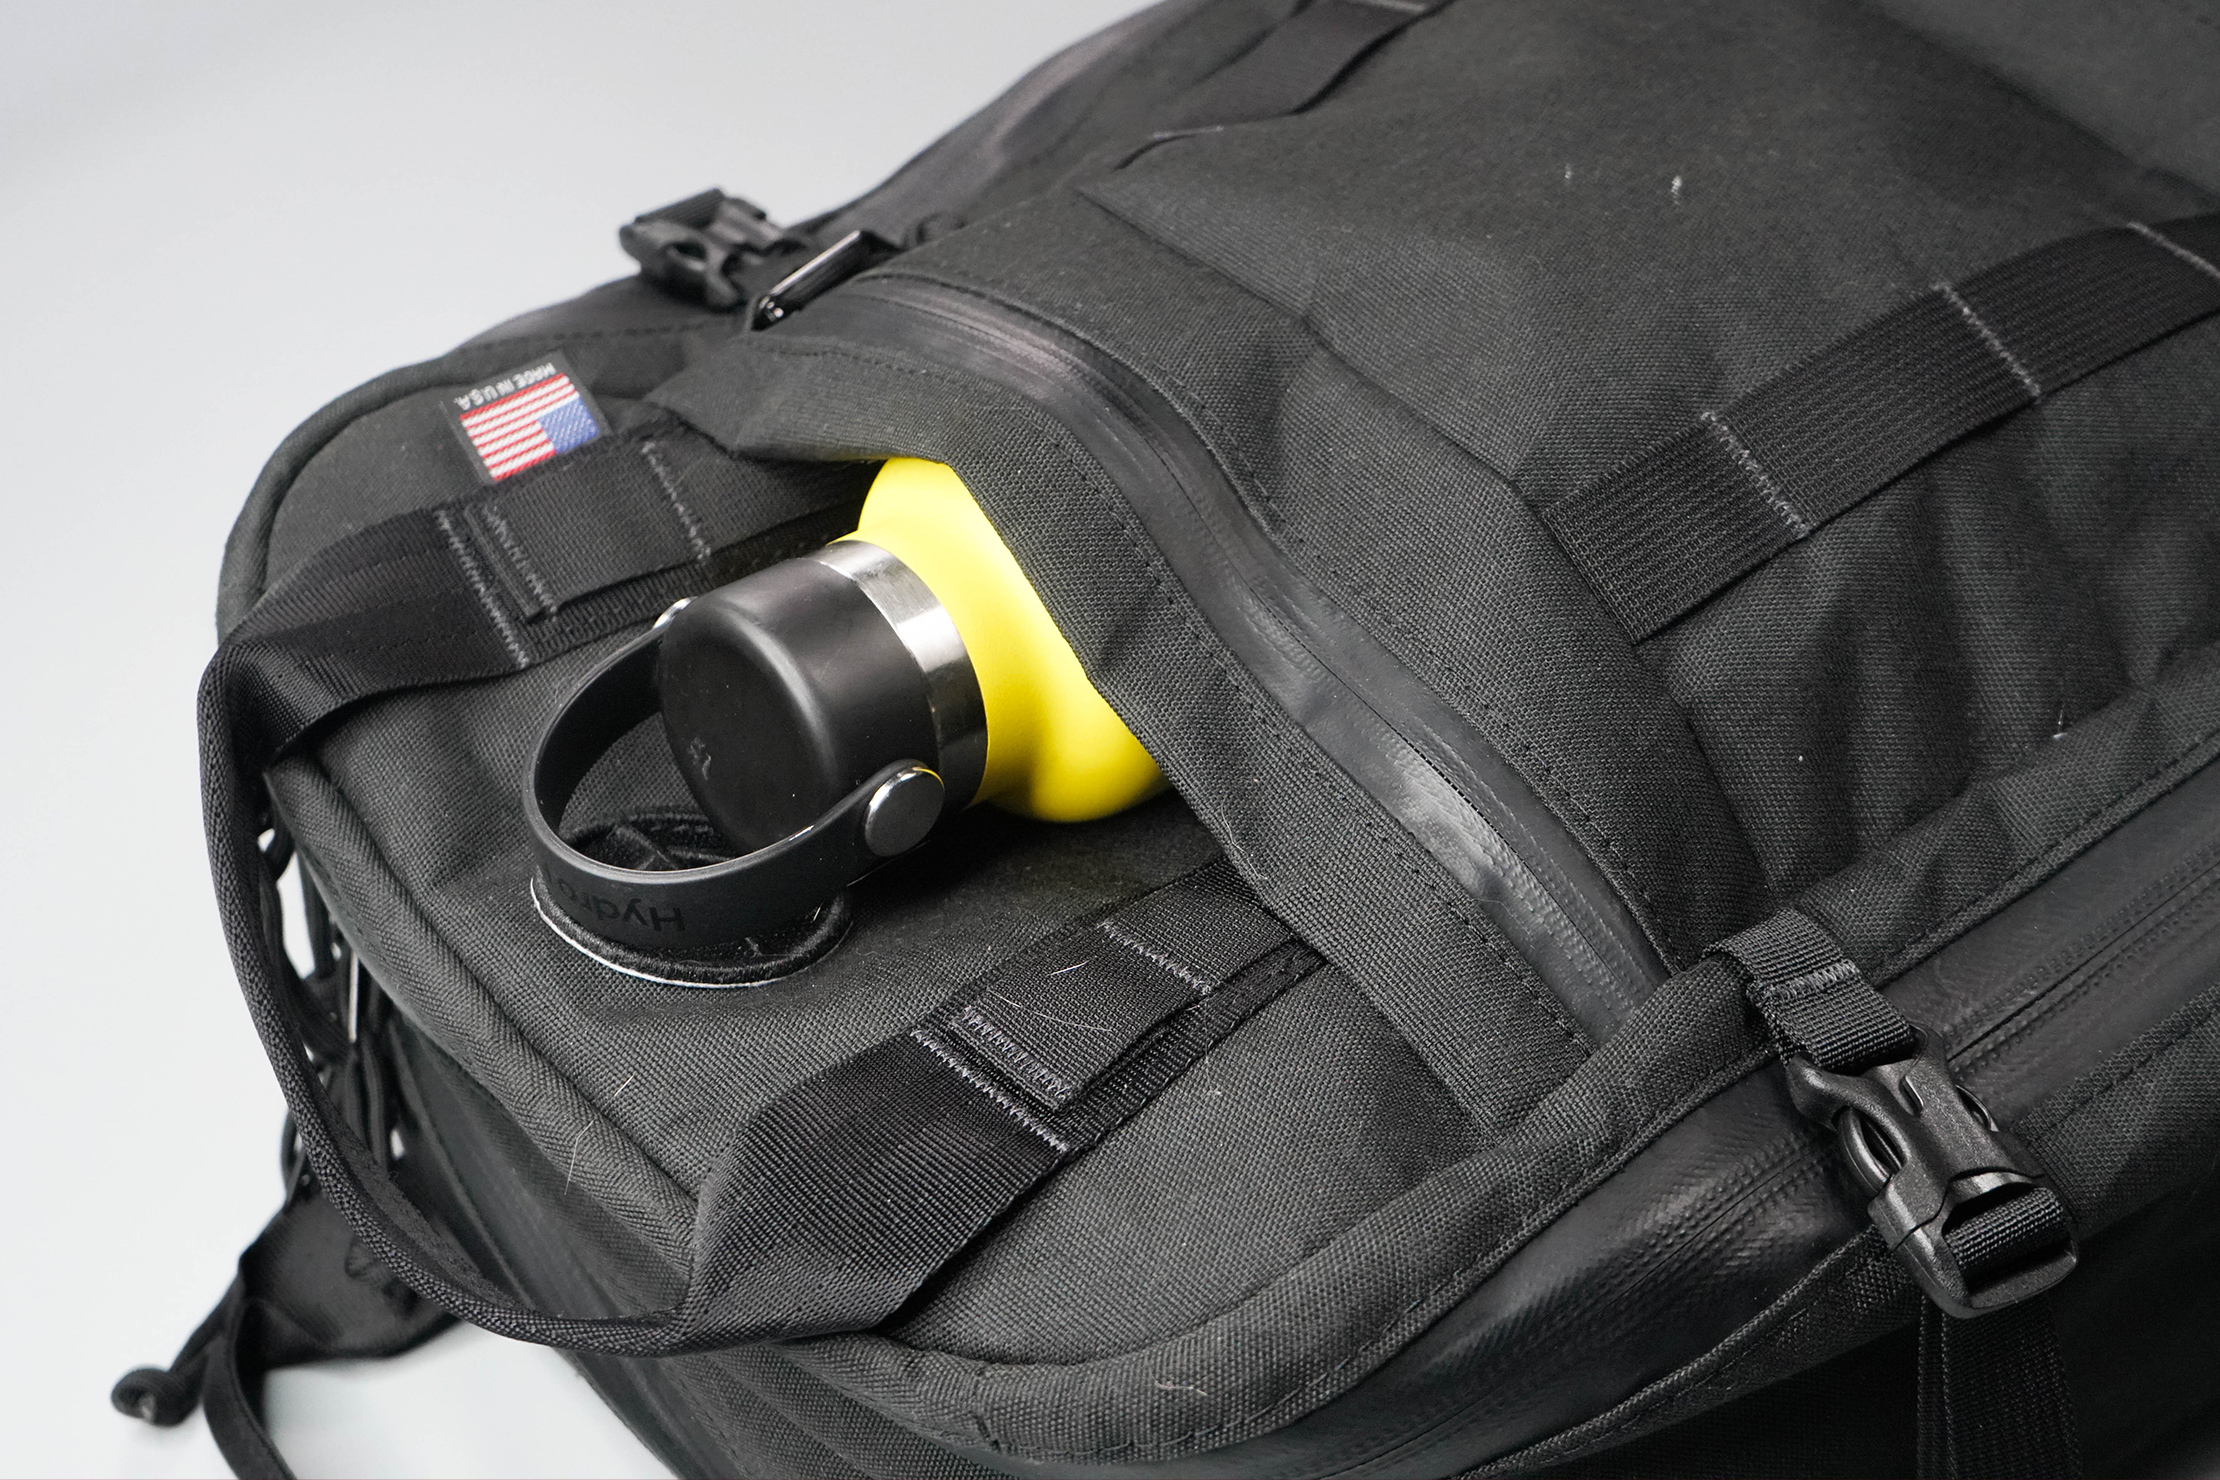 North St. Bags Weekender Backpack Water Bottle Pocket